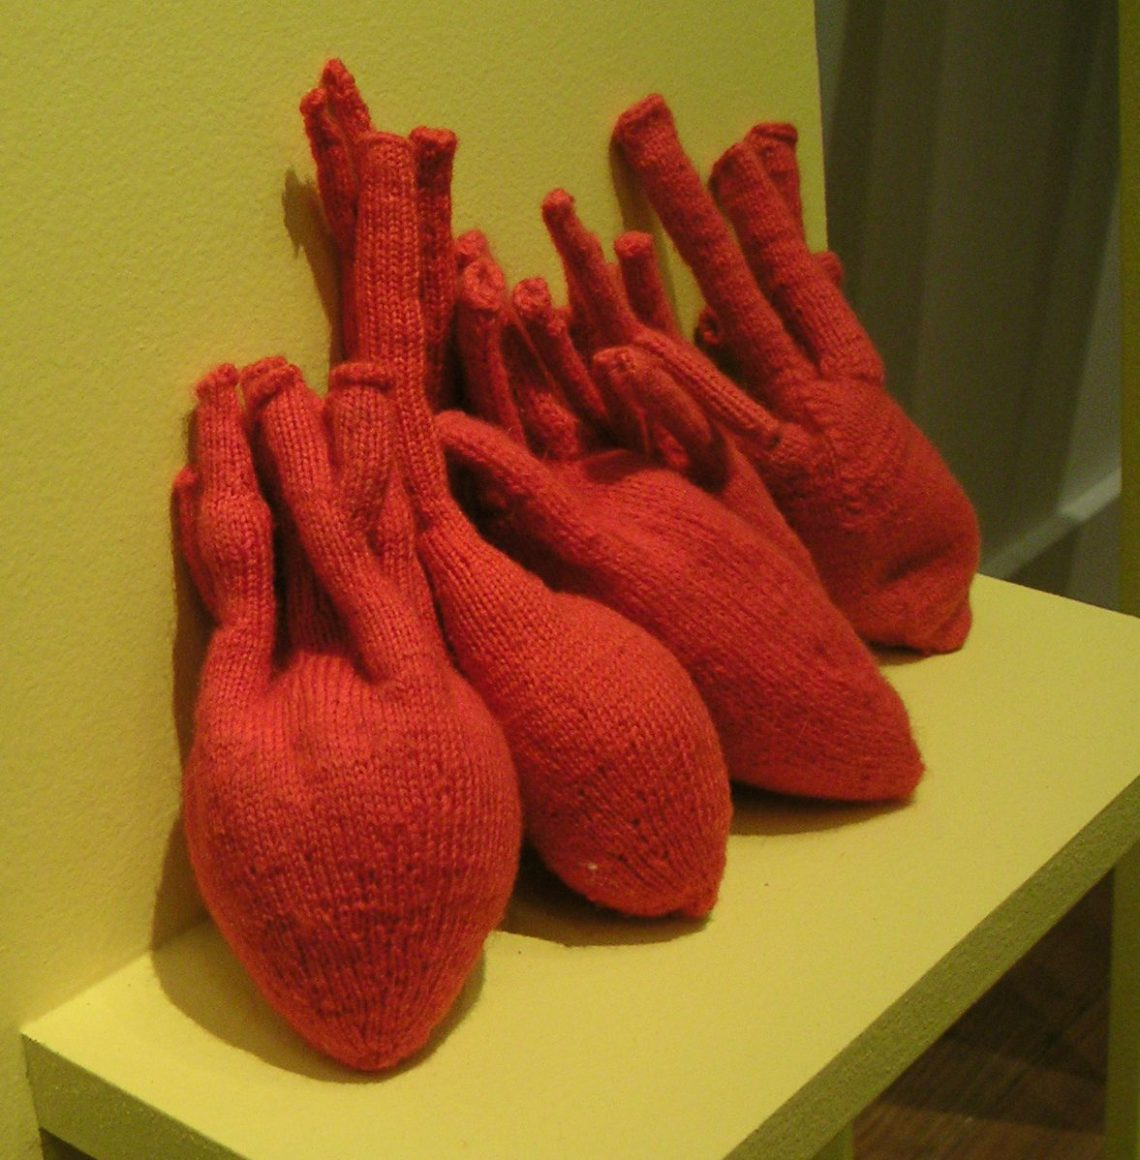 Iris Eichenberg, Hearts, Golden Clogs, Ornamentum Gallery, 2007. Foto met dank aan Andrea Wagner©